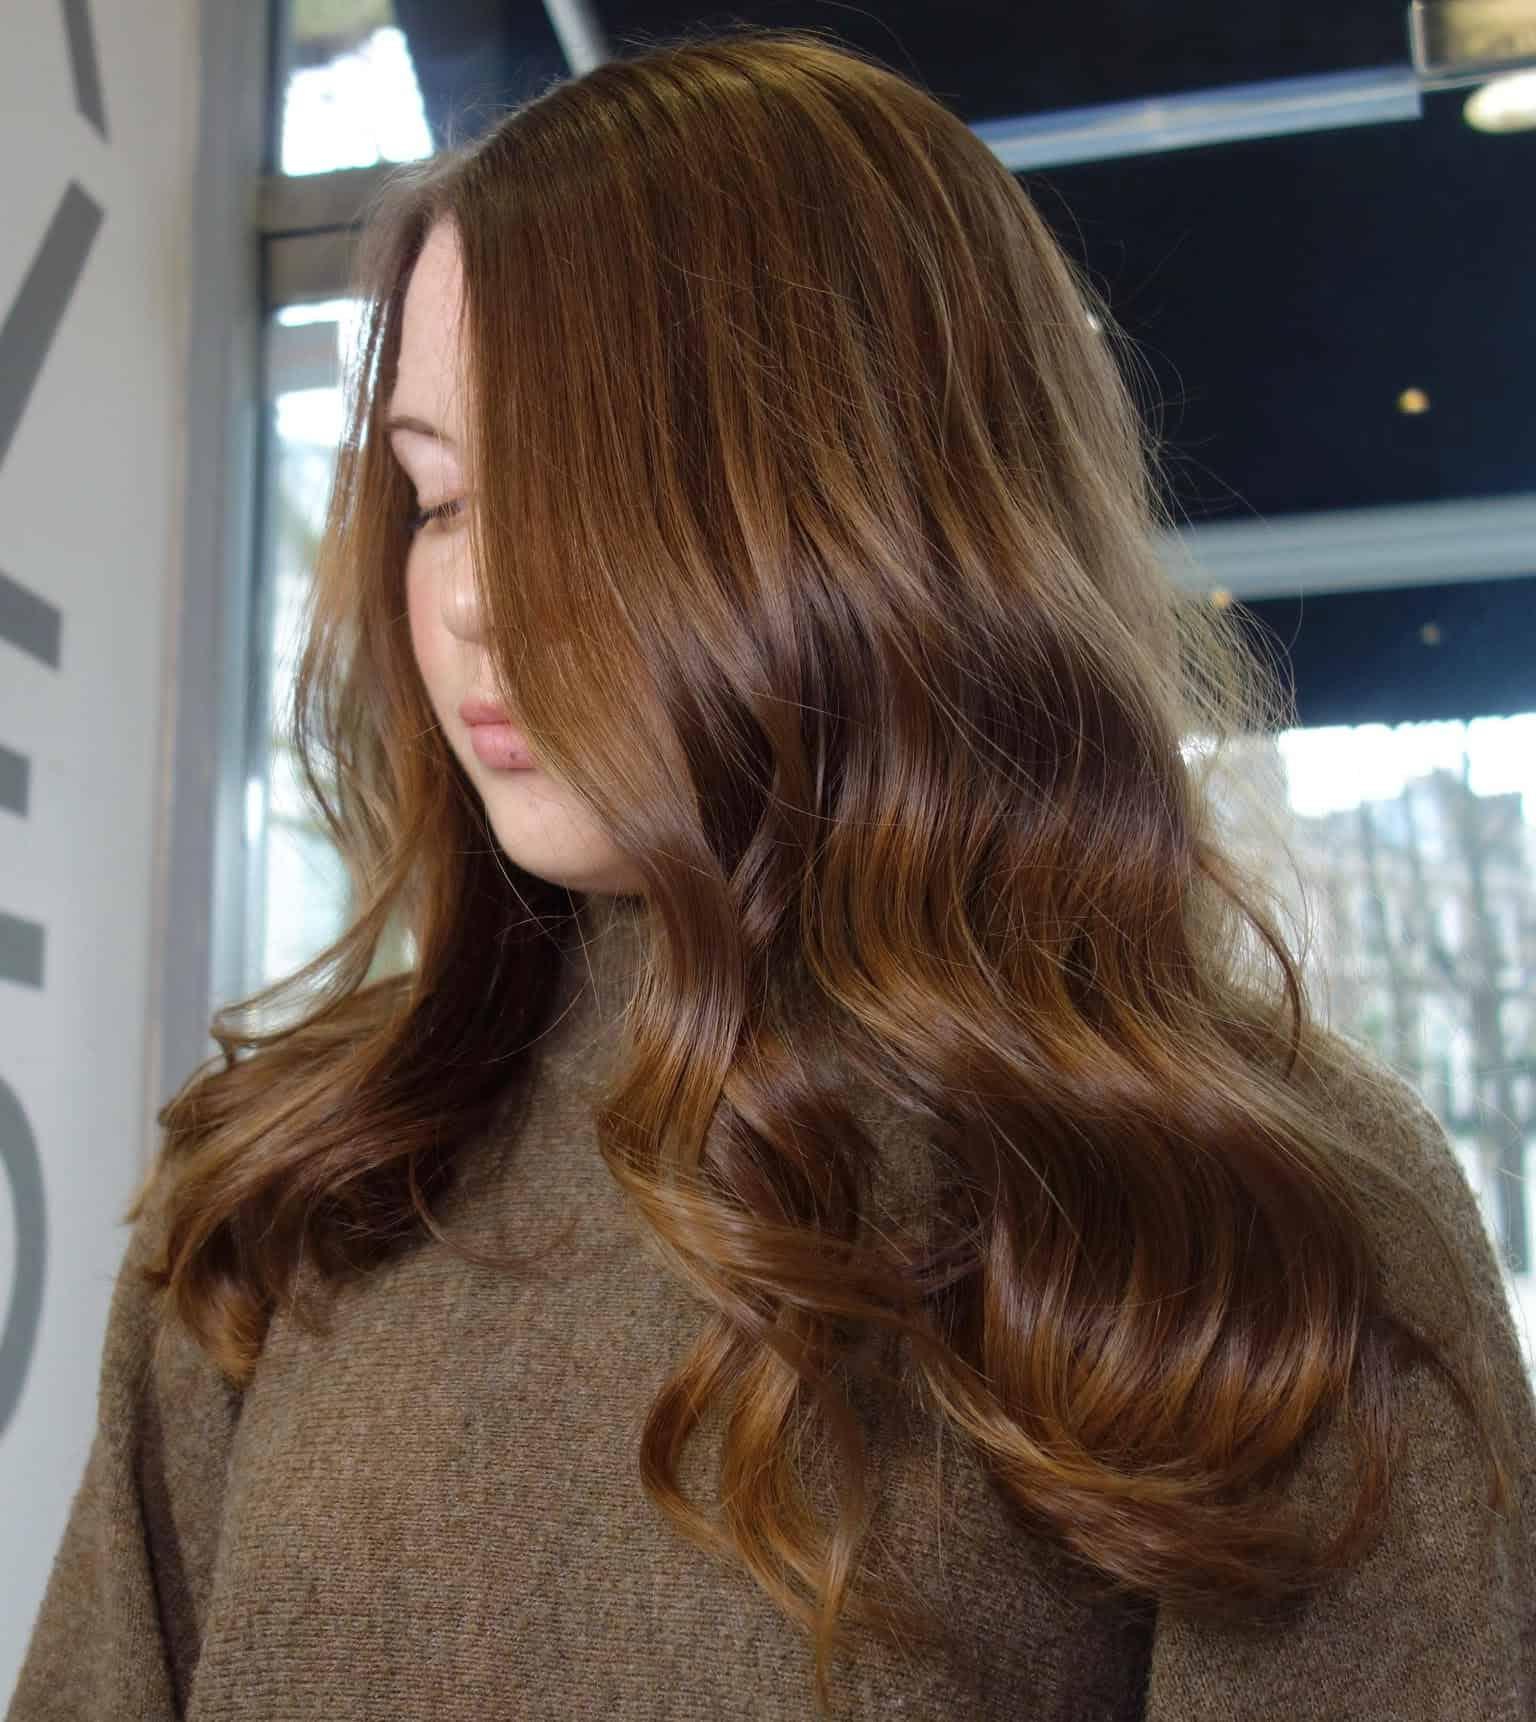 Hair colouring, Hair Styling - Hair Salon Client | Kaplan Atelier - Holland Park Avenue, London